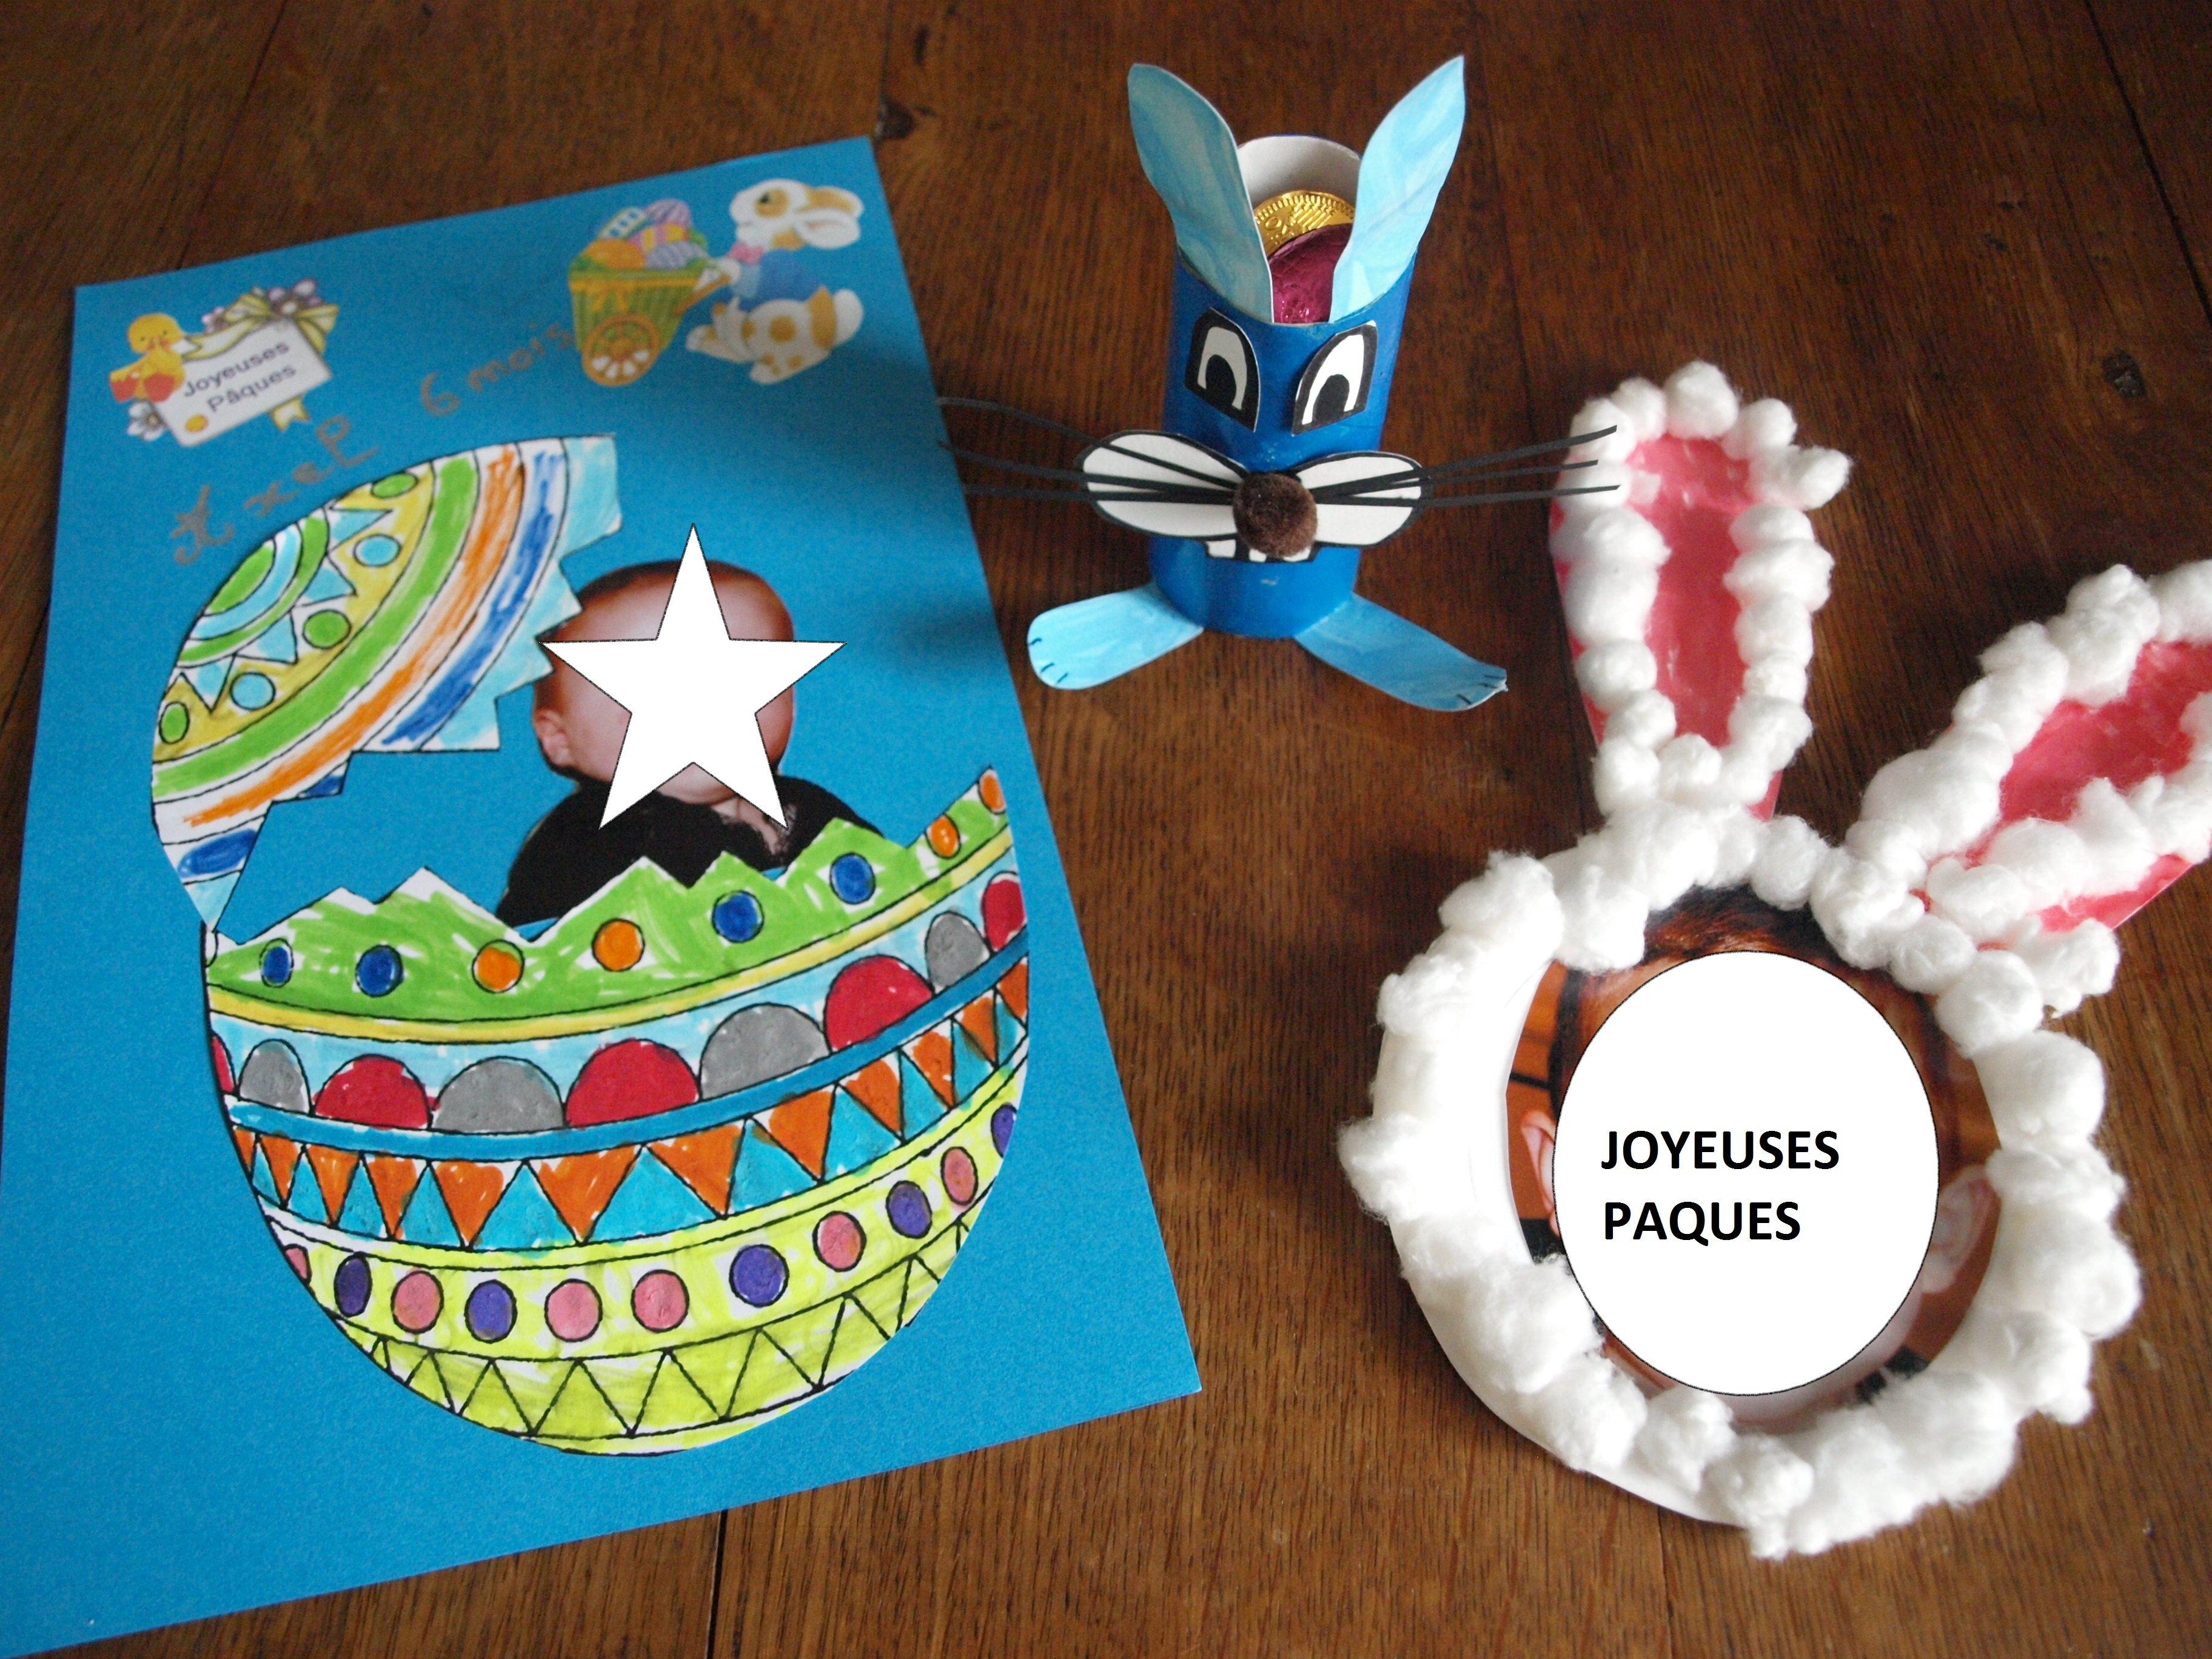 Coloriage Joyeuses Paques Maternelle.Christelle Assistante Maternelle A Naintre Paques Lapins Oeufs